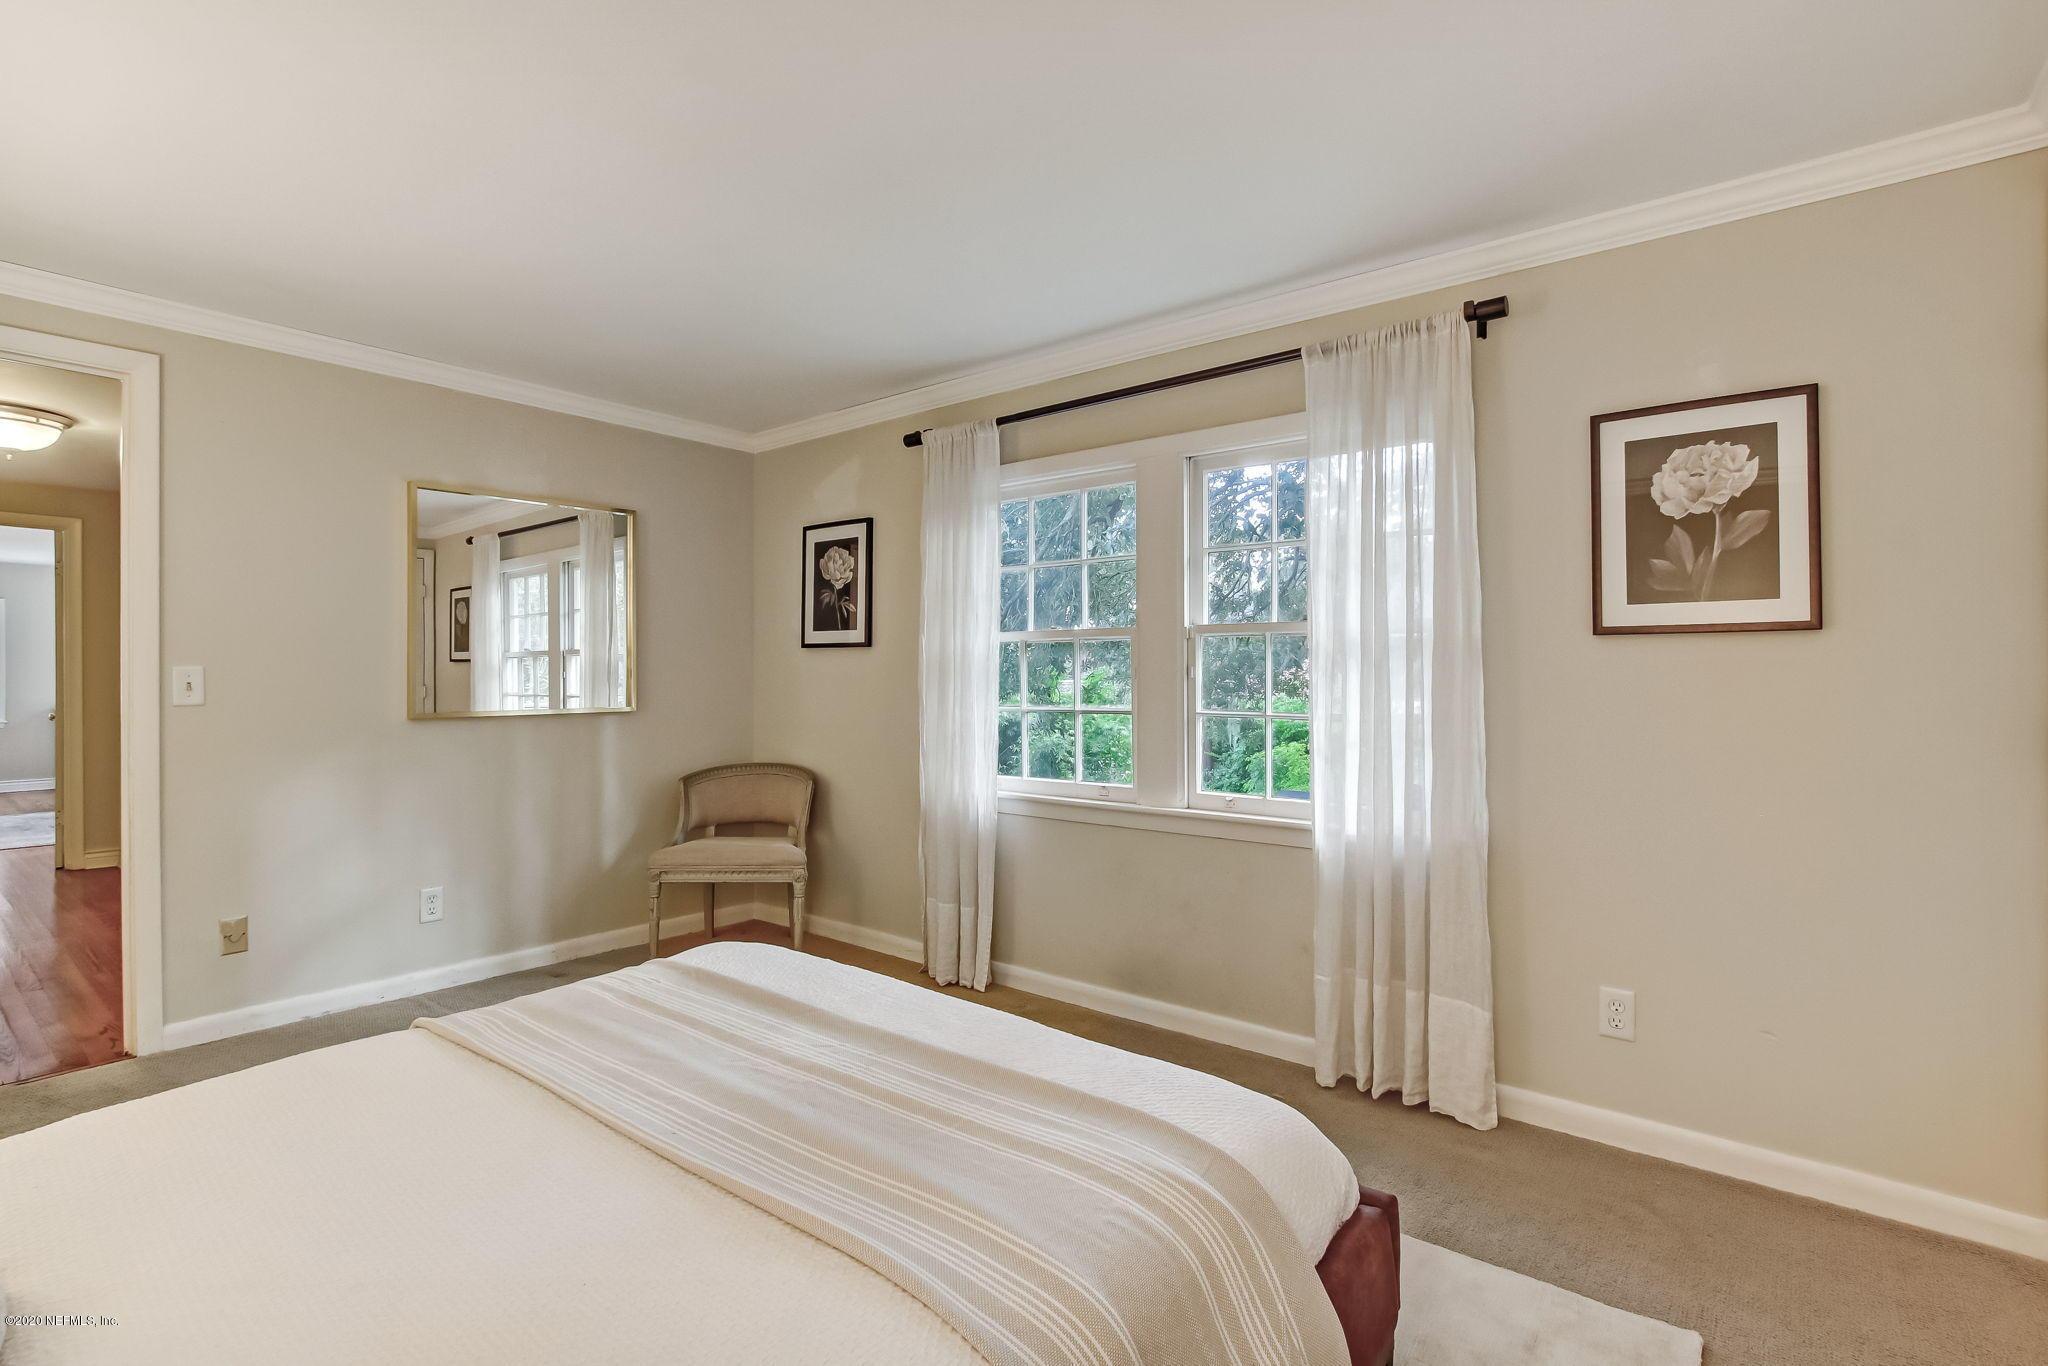 1872 RIBAULT, JACKSONVILLE, FLORIDA 32205, 5 Bedrooms Bedrooms, ,3 BathroomsBathrooms,Residential,For sale,RIBAULT,1056162